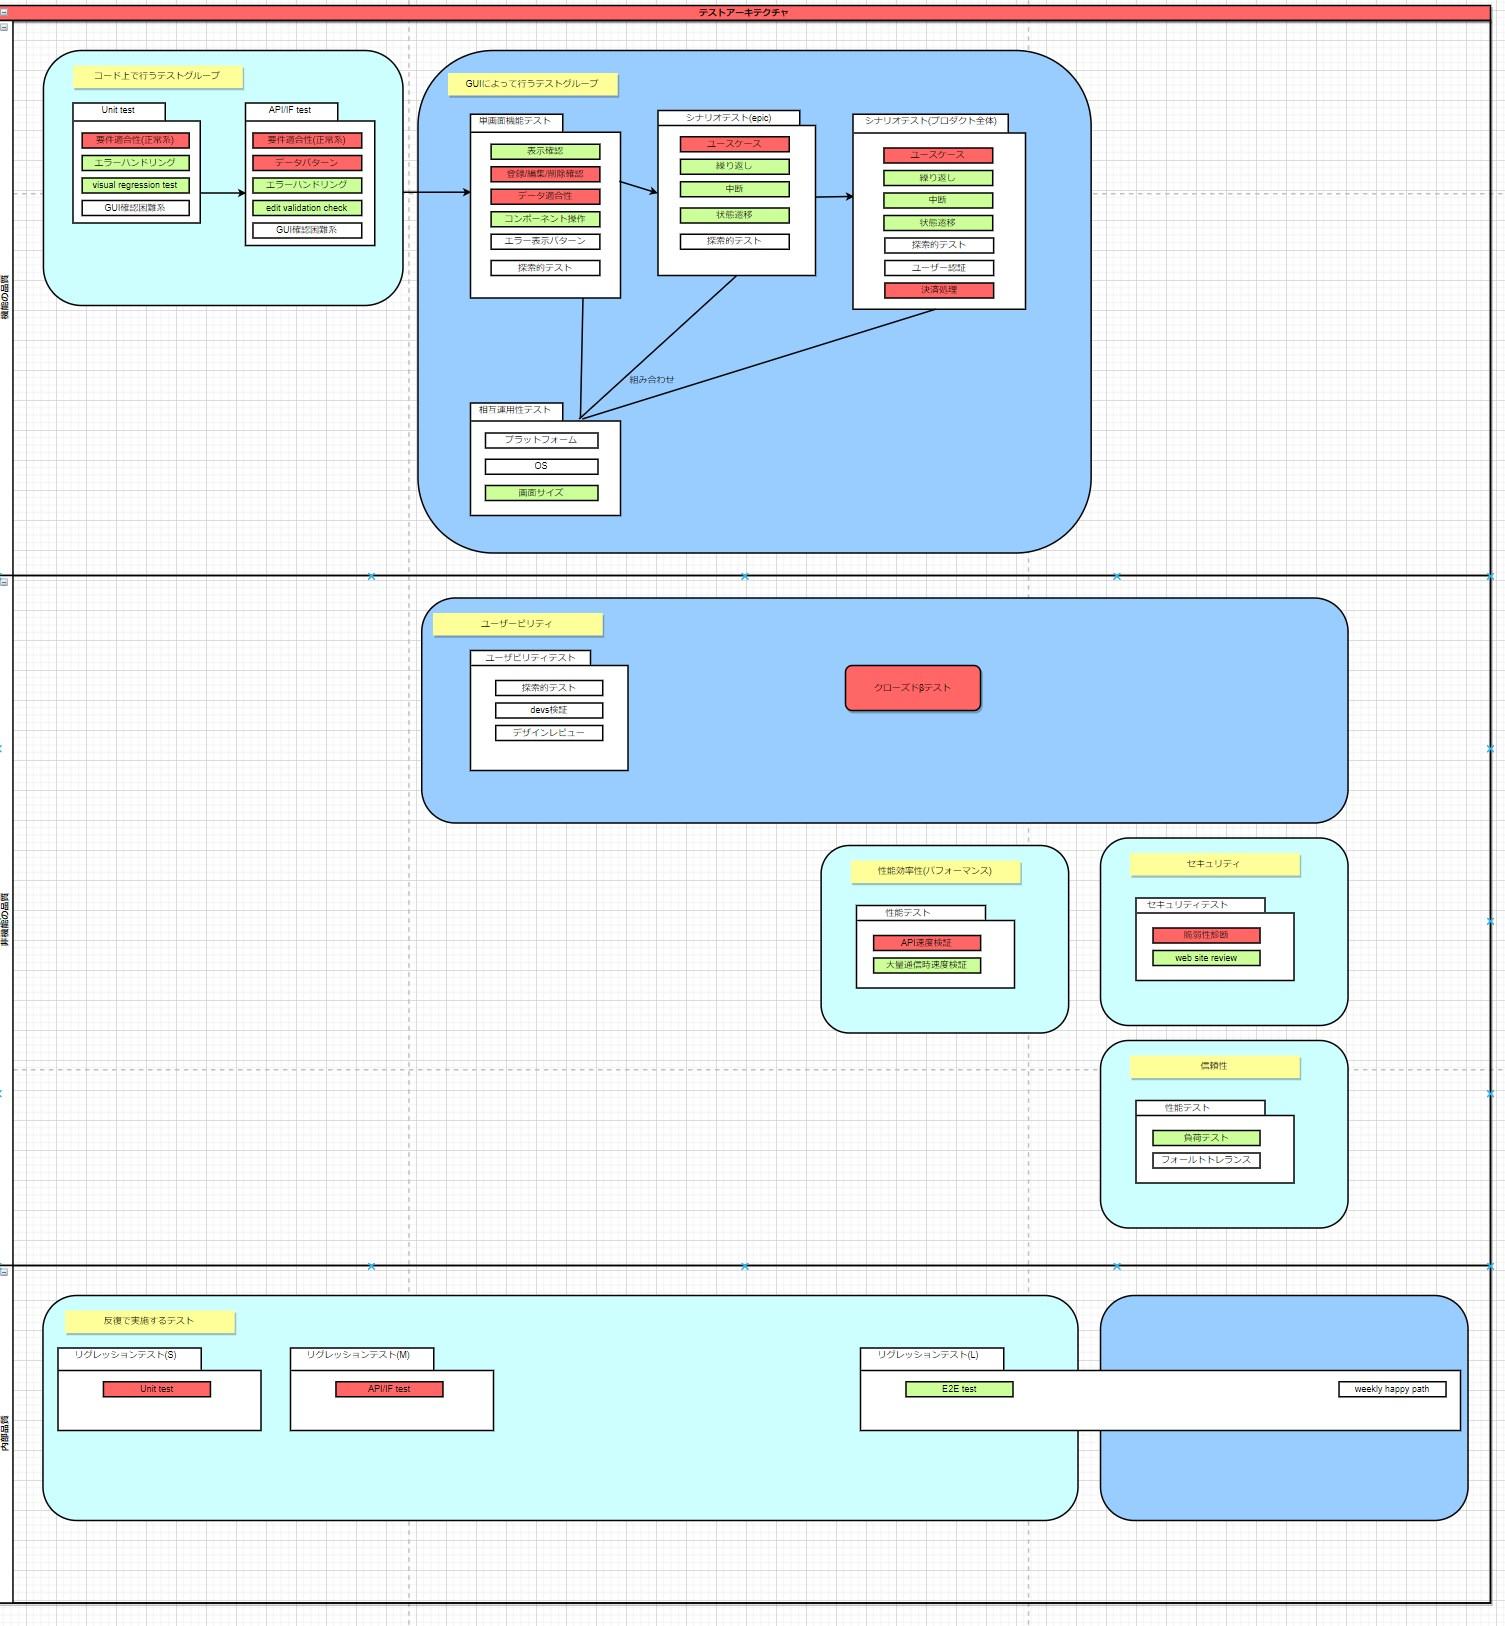 test-architecture